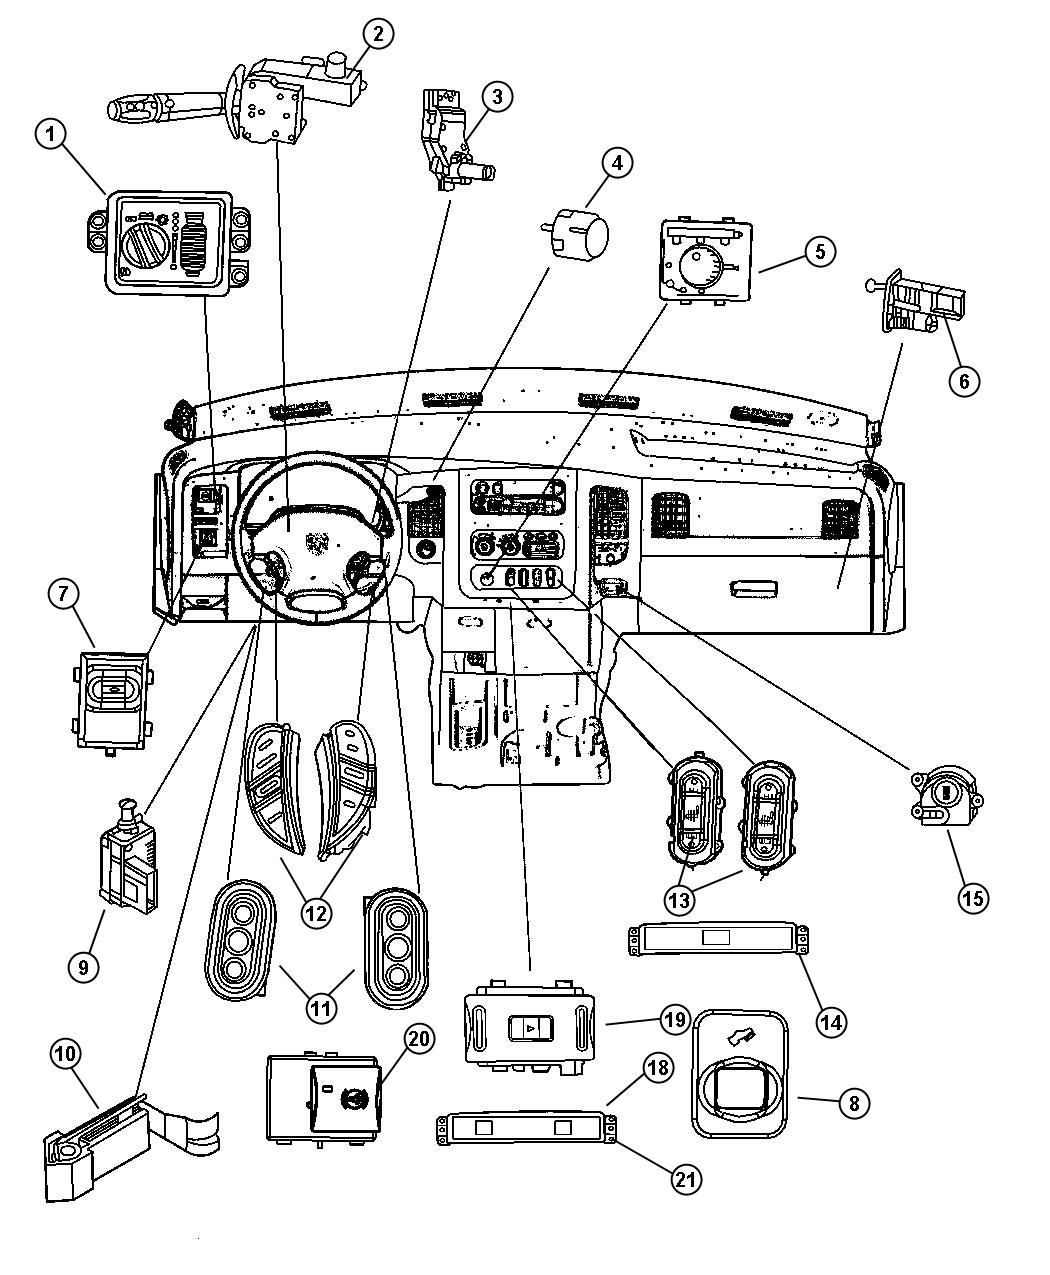 2008 dodge ram 1500 bezel  switch   xap   adjustable pedal